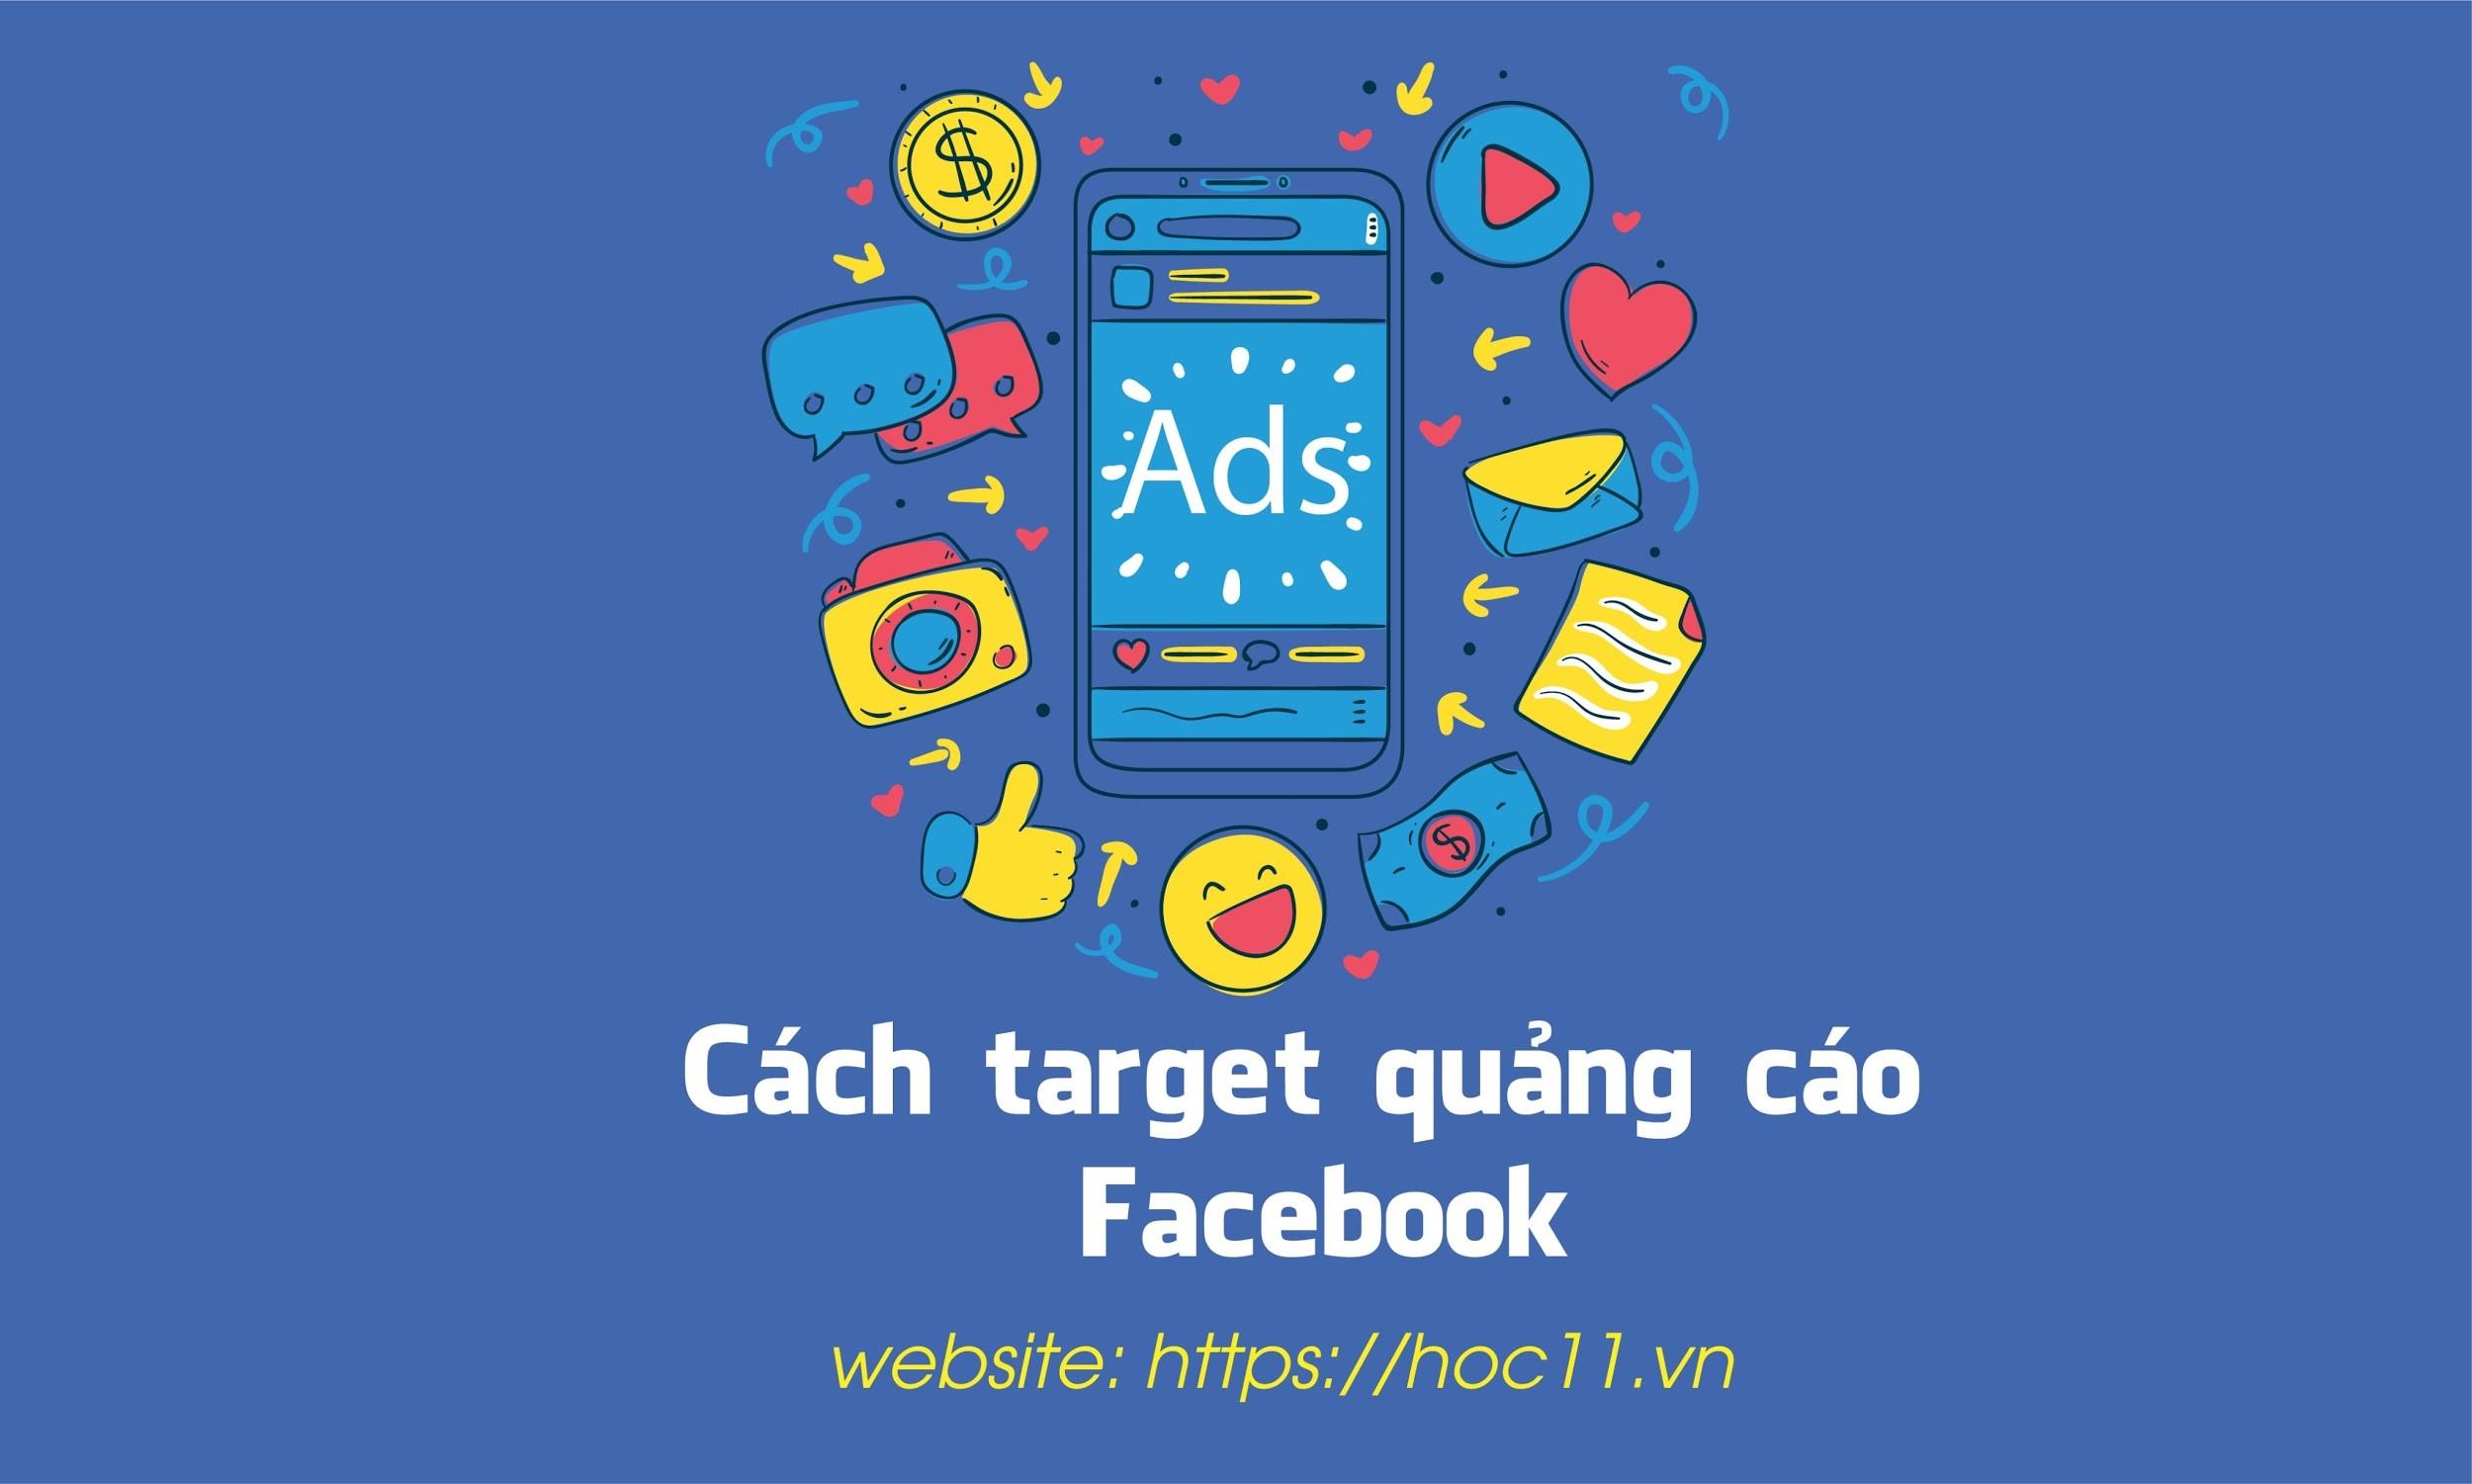 Cách target quảng cáo Facebook